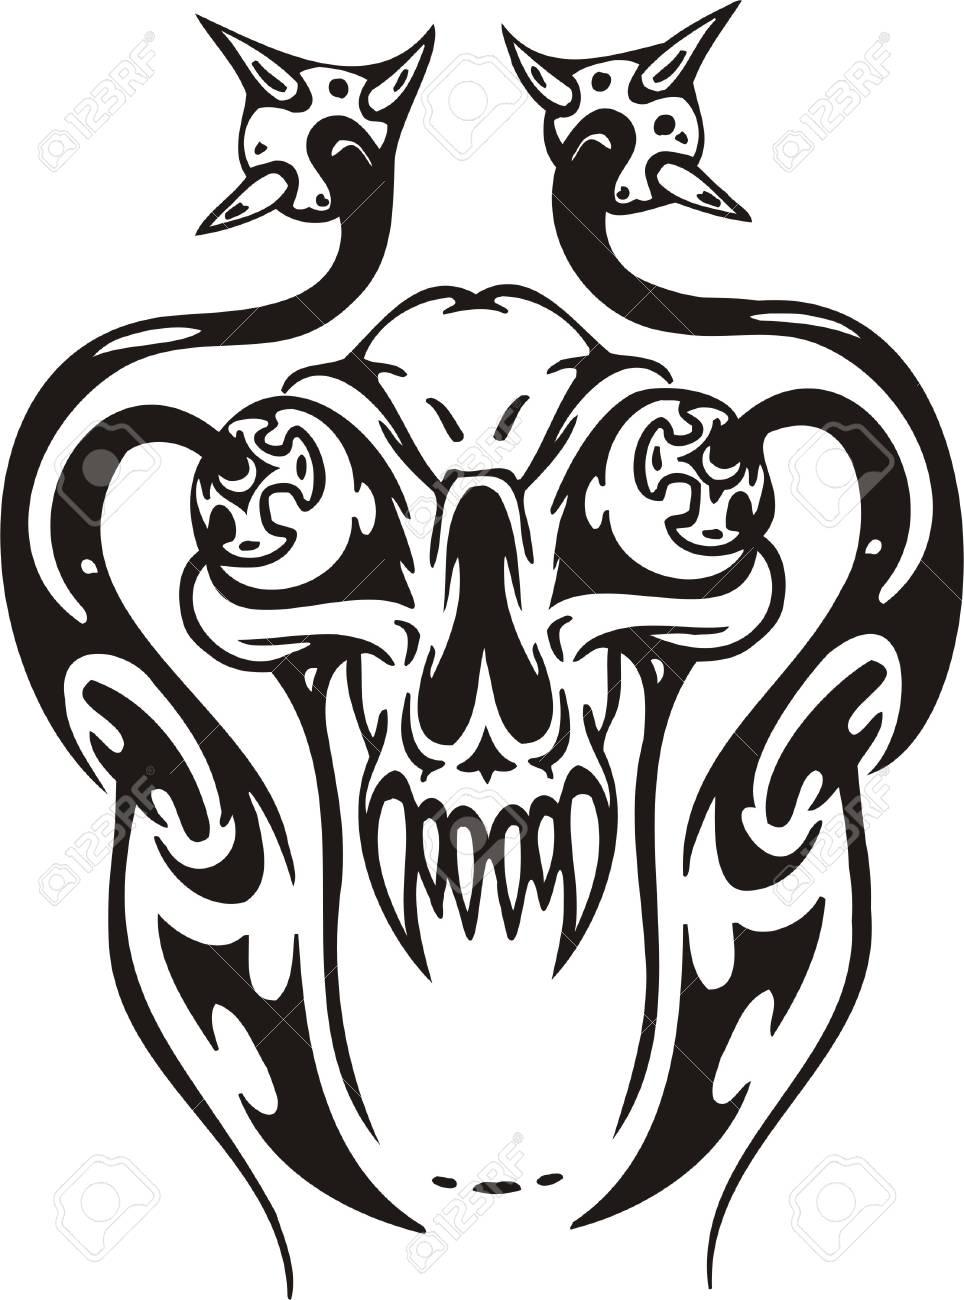 Cyber Skull - illustration. Ready for vinyl cutting. Stock Vector - 8132130